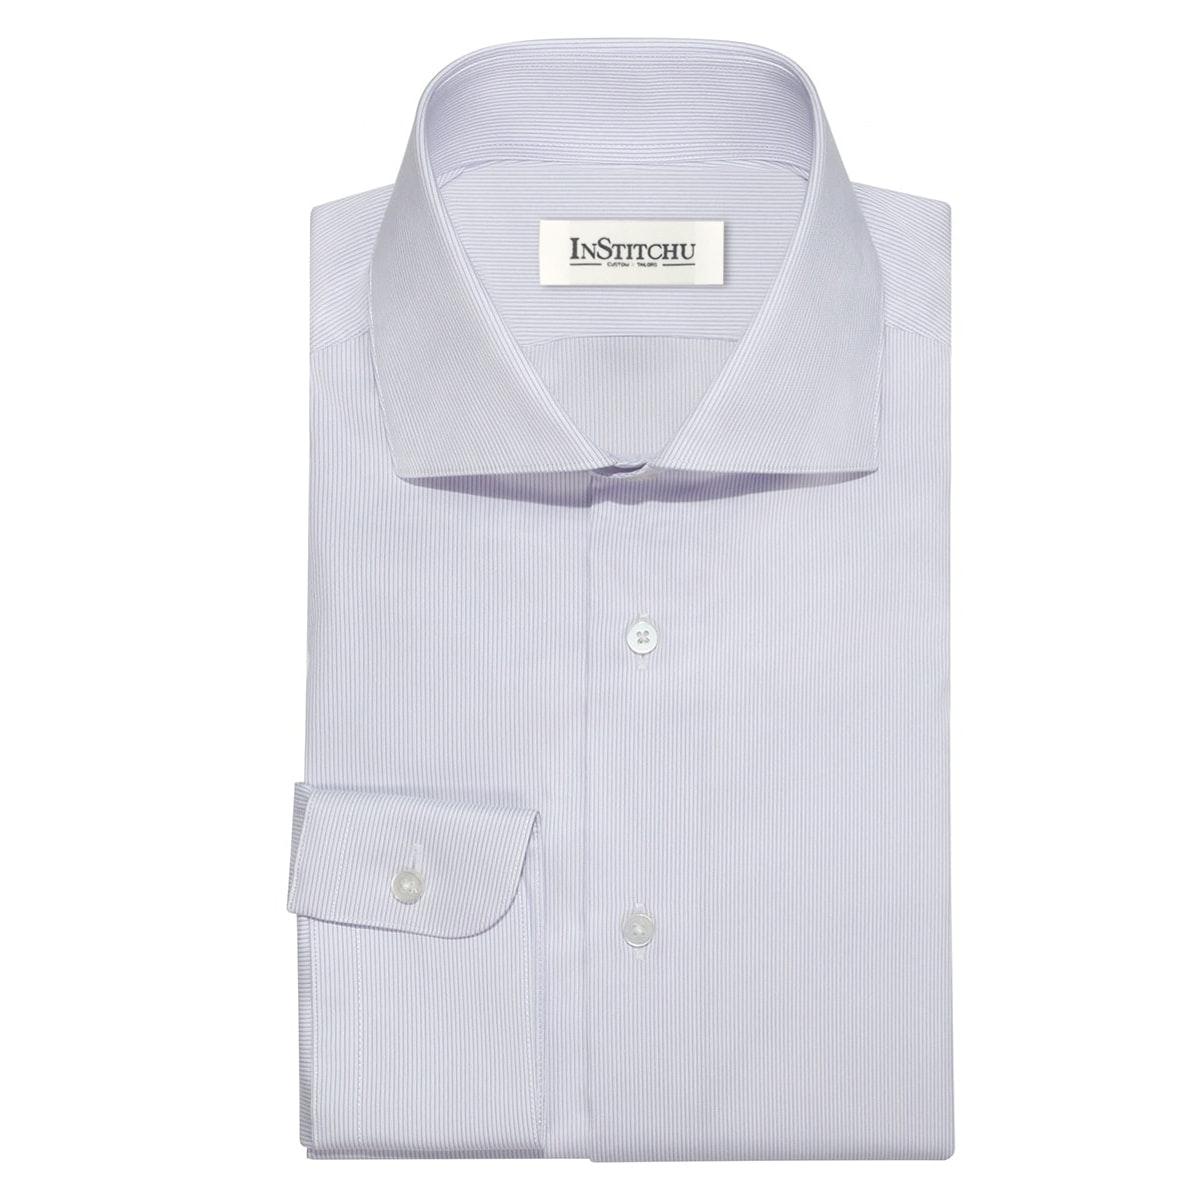 InStitchu Collection The Sunshine Purple Shirt